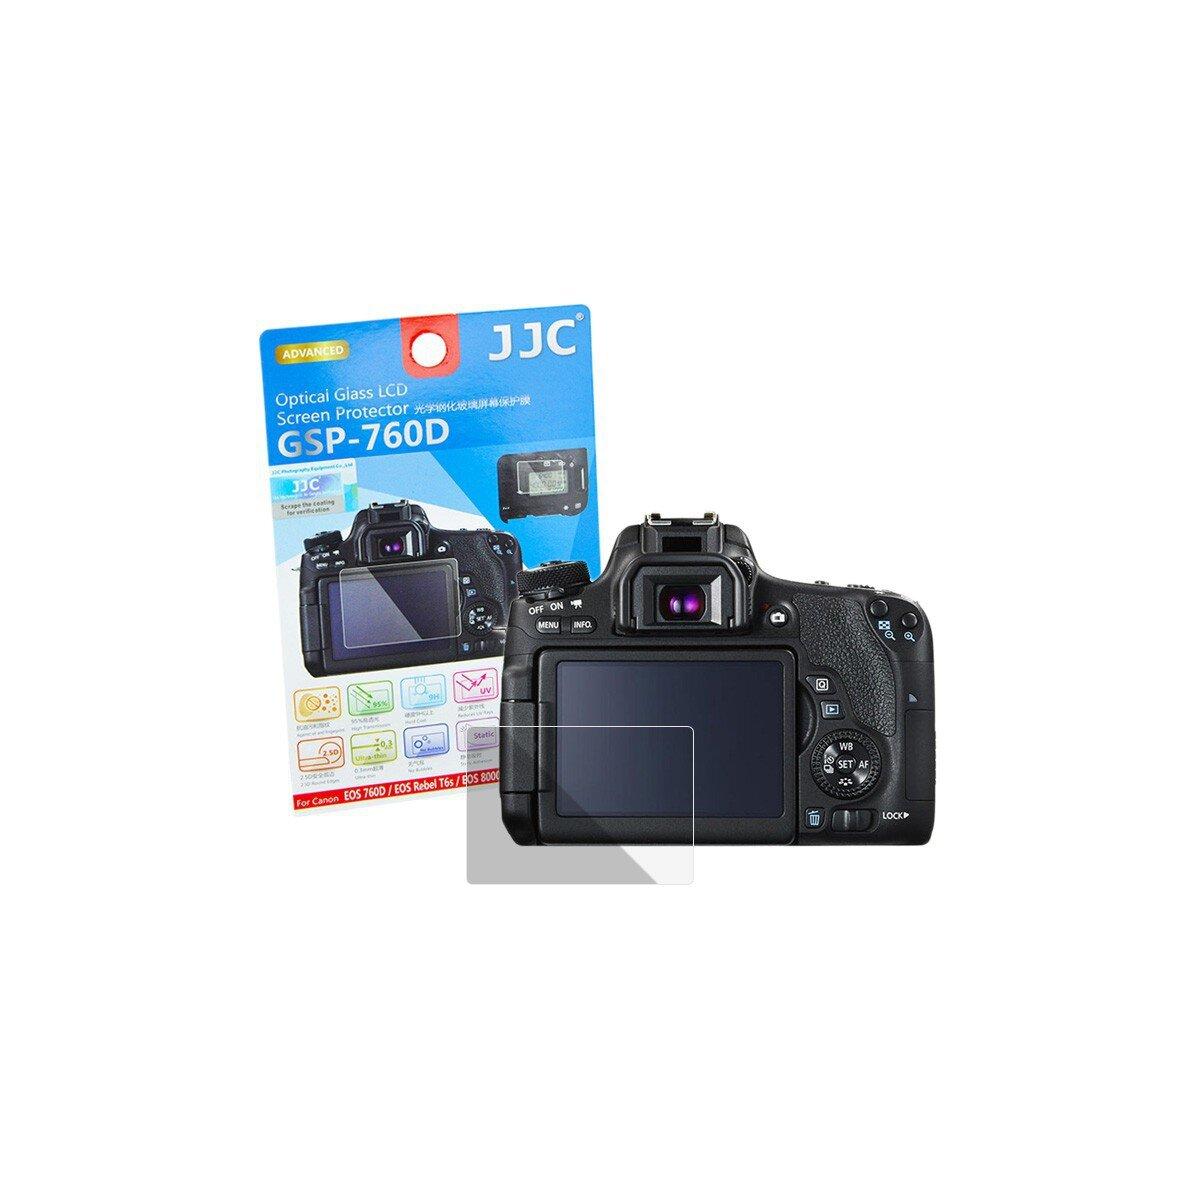 Hochwertiger Displayschutz Screen Protector aus gehaertetem Echtglas, passend fuer Canon EOS 760D & EOS 8000D - JJC GSP-760D